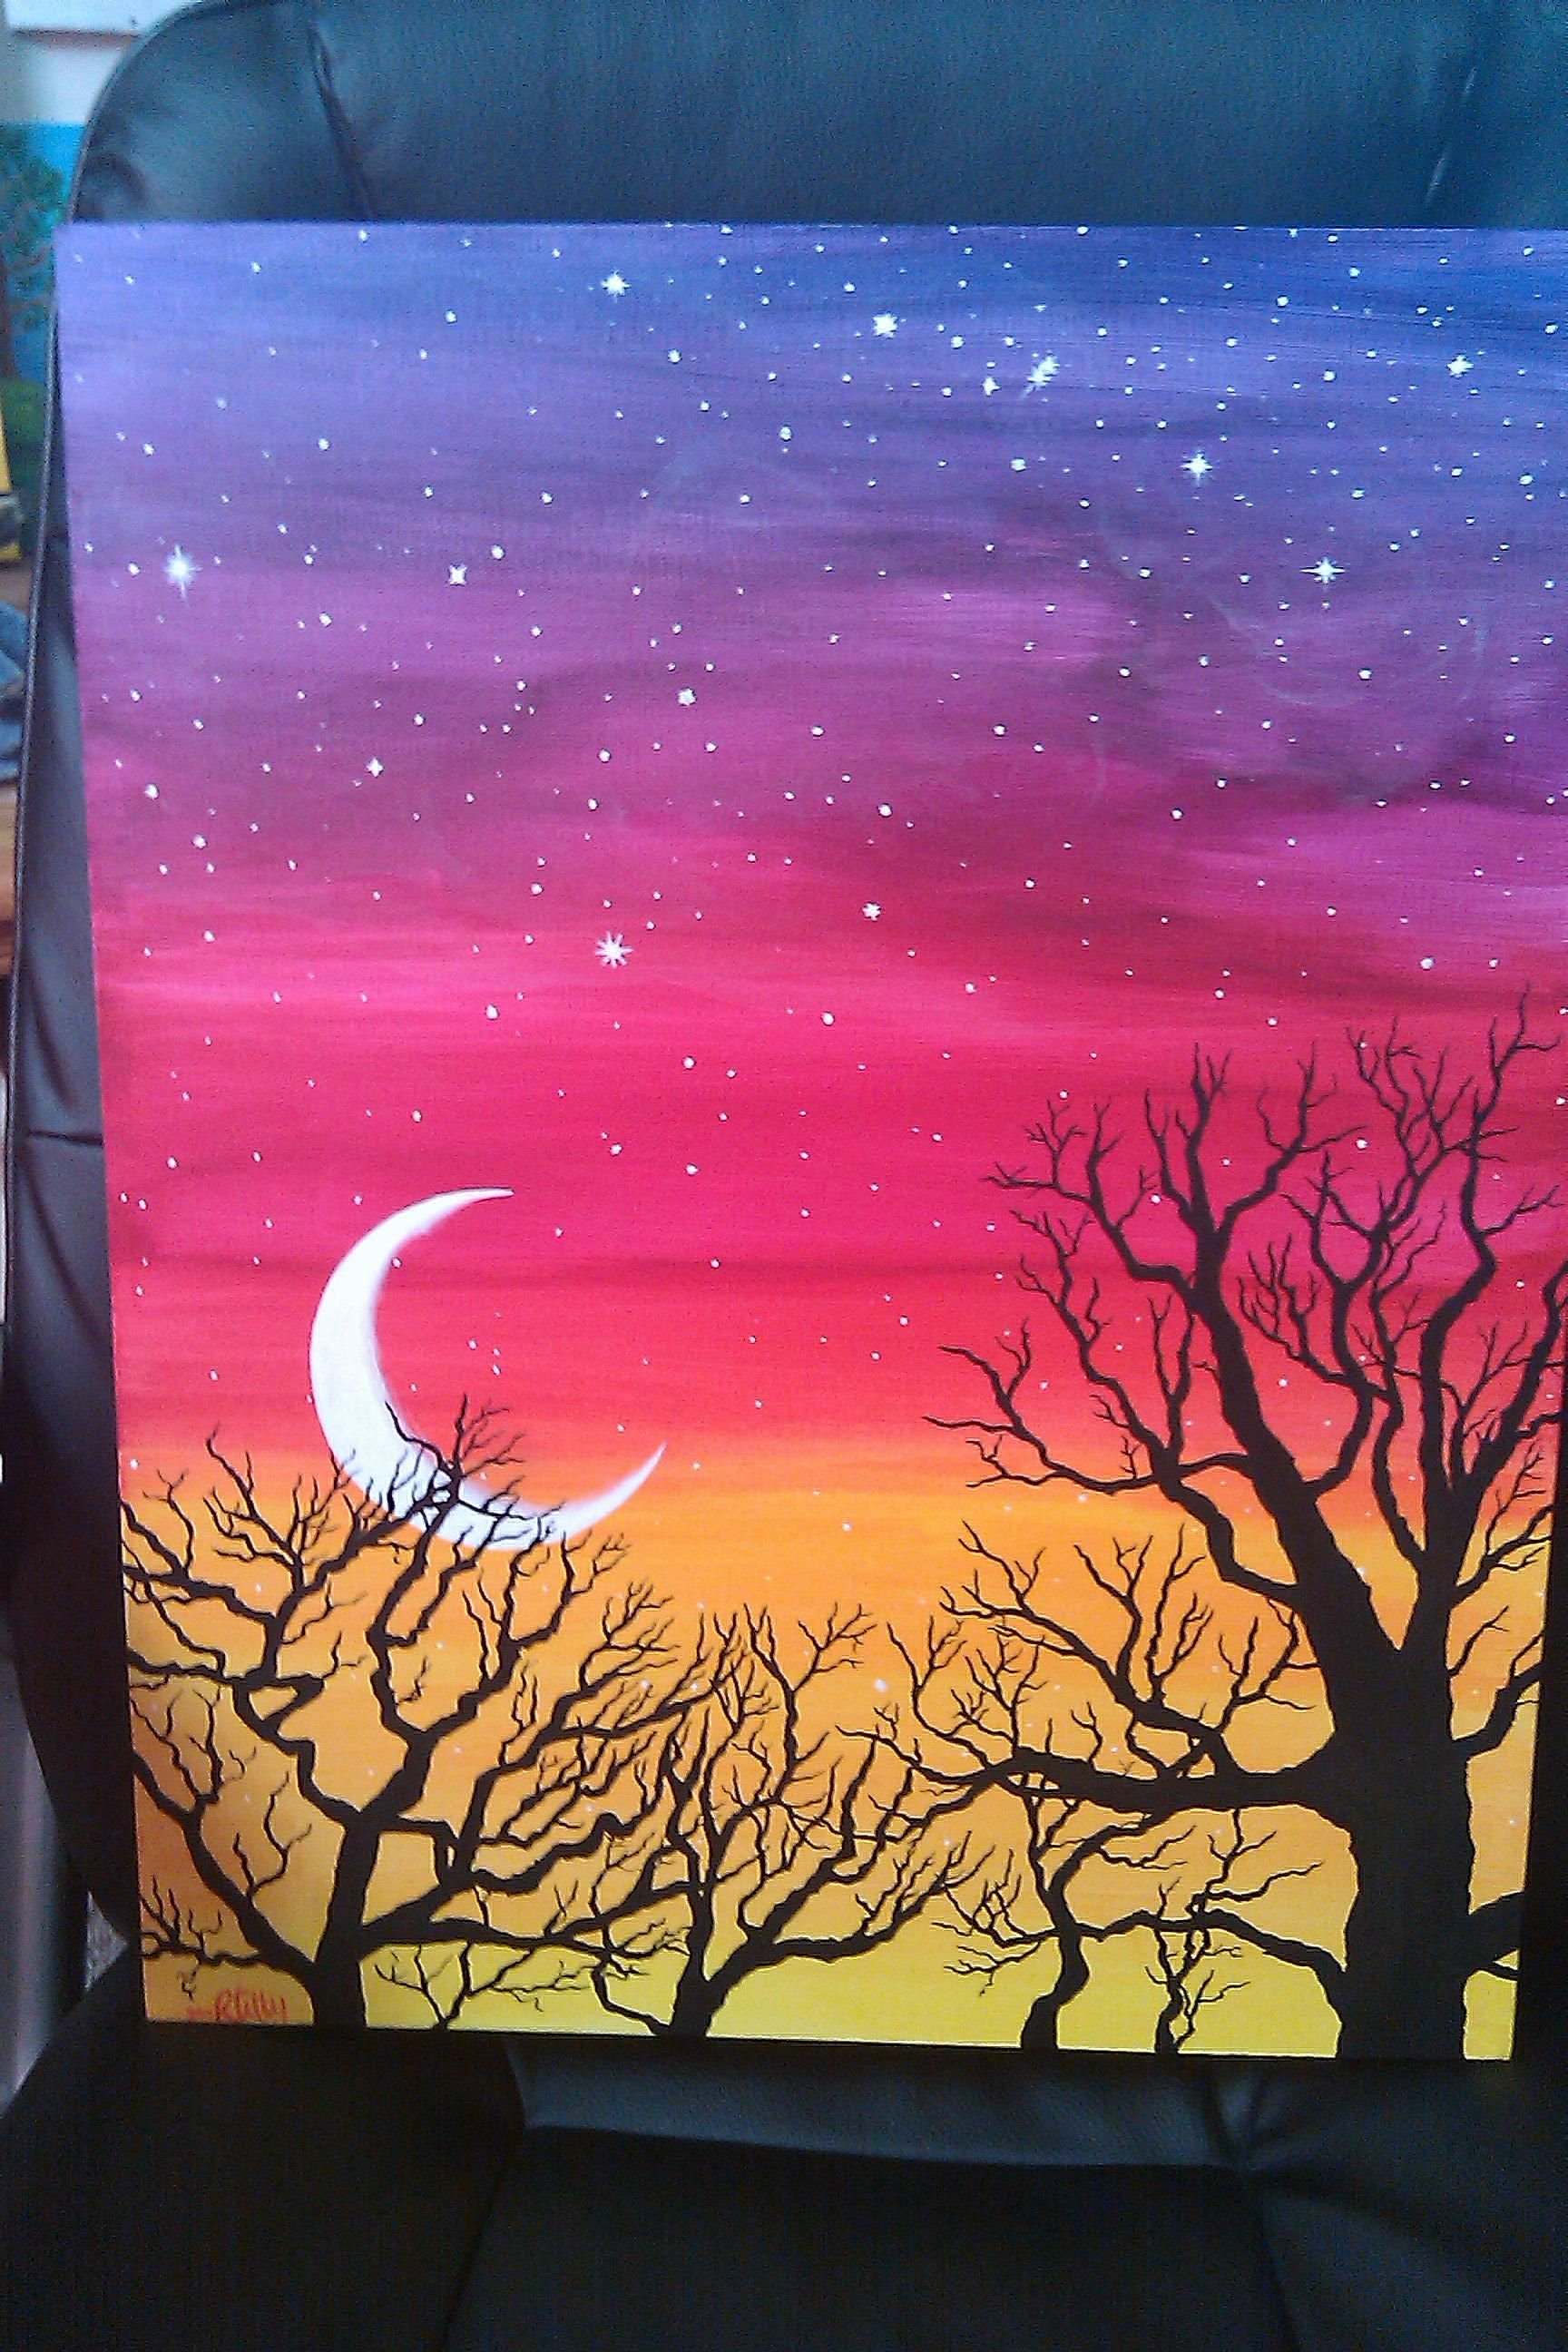 """Untitled - Sky/Tree Motif"" | art | Pinterest | Paintings ..."